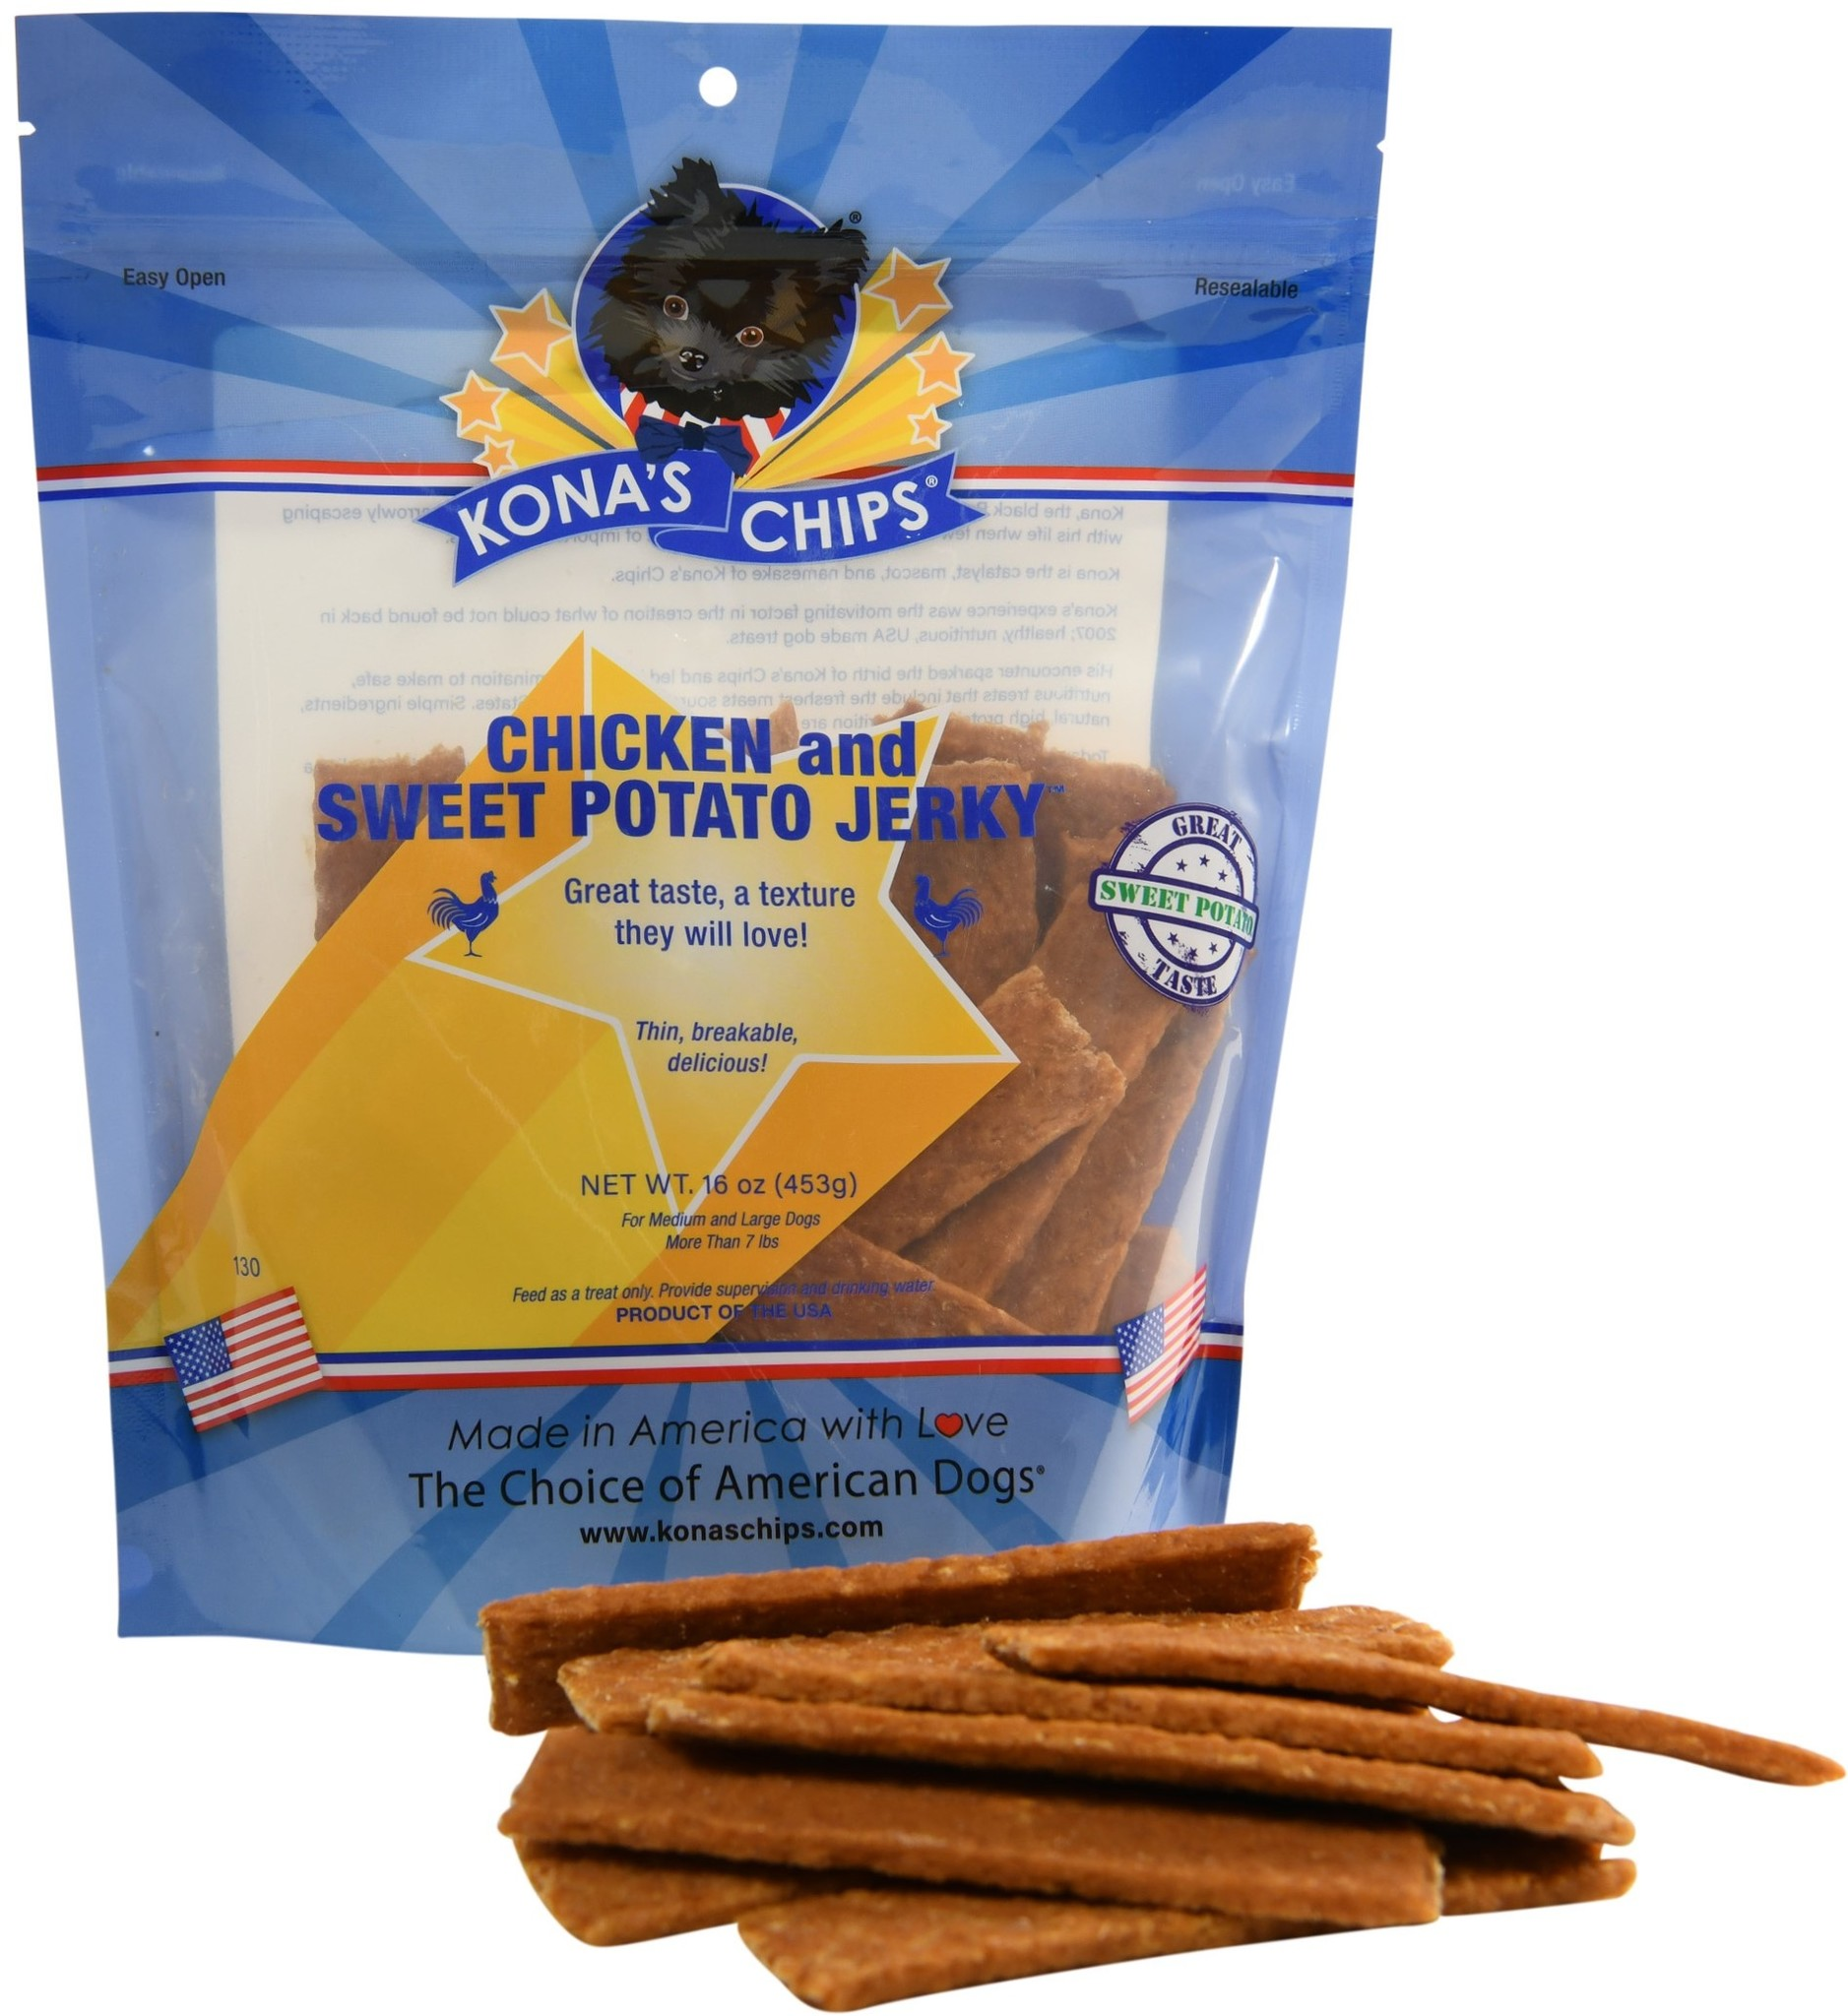 Kona's Chips Kona's Chips Chicken and Sweet Pototo Jerky